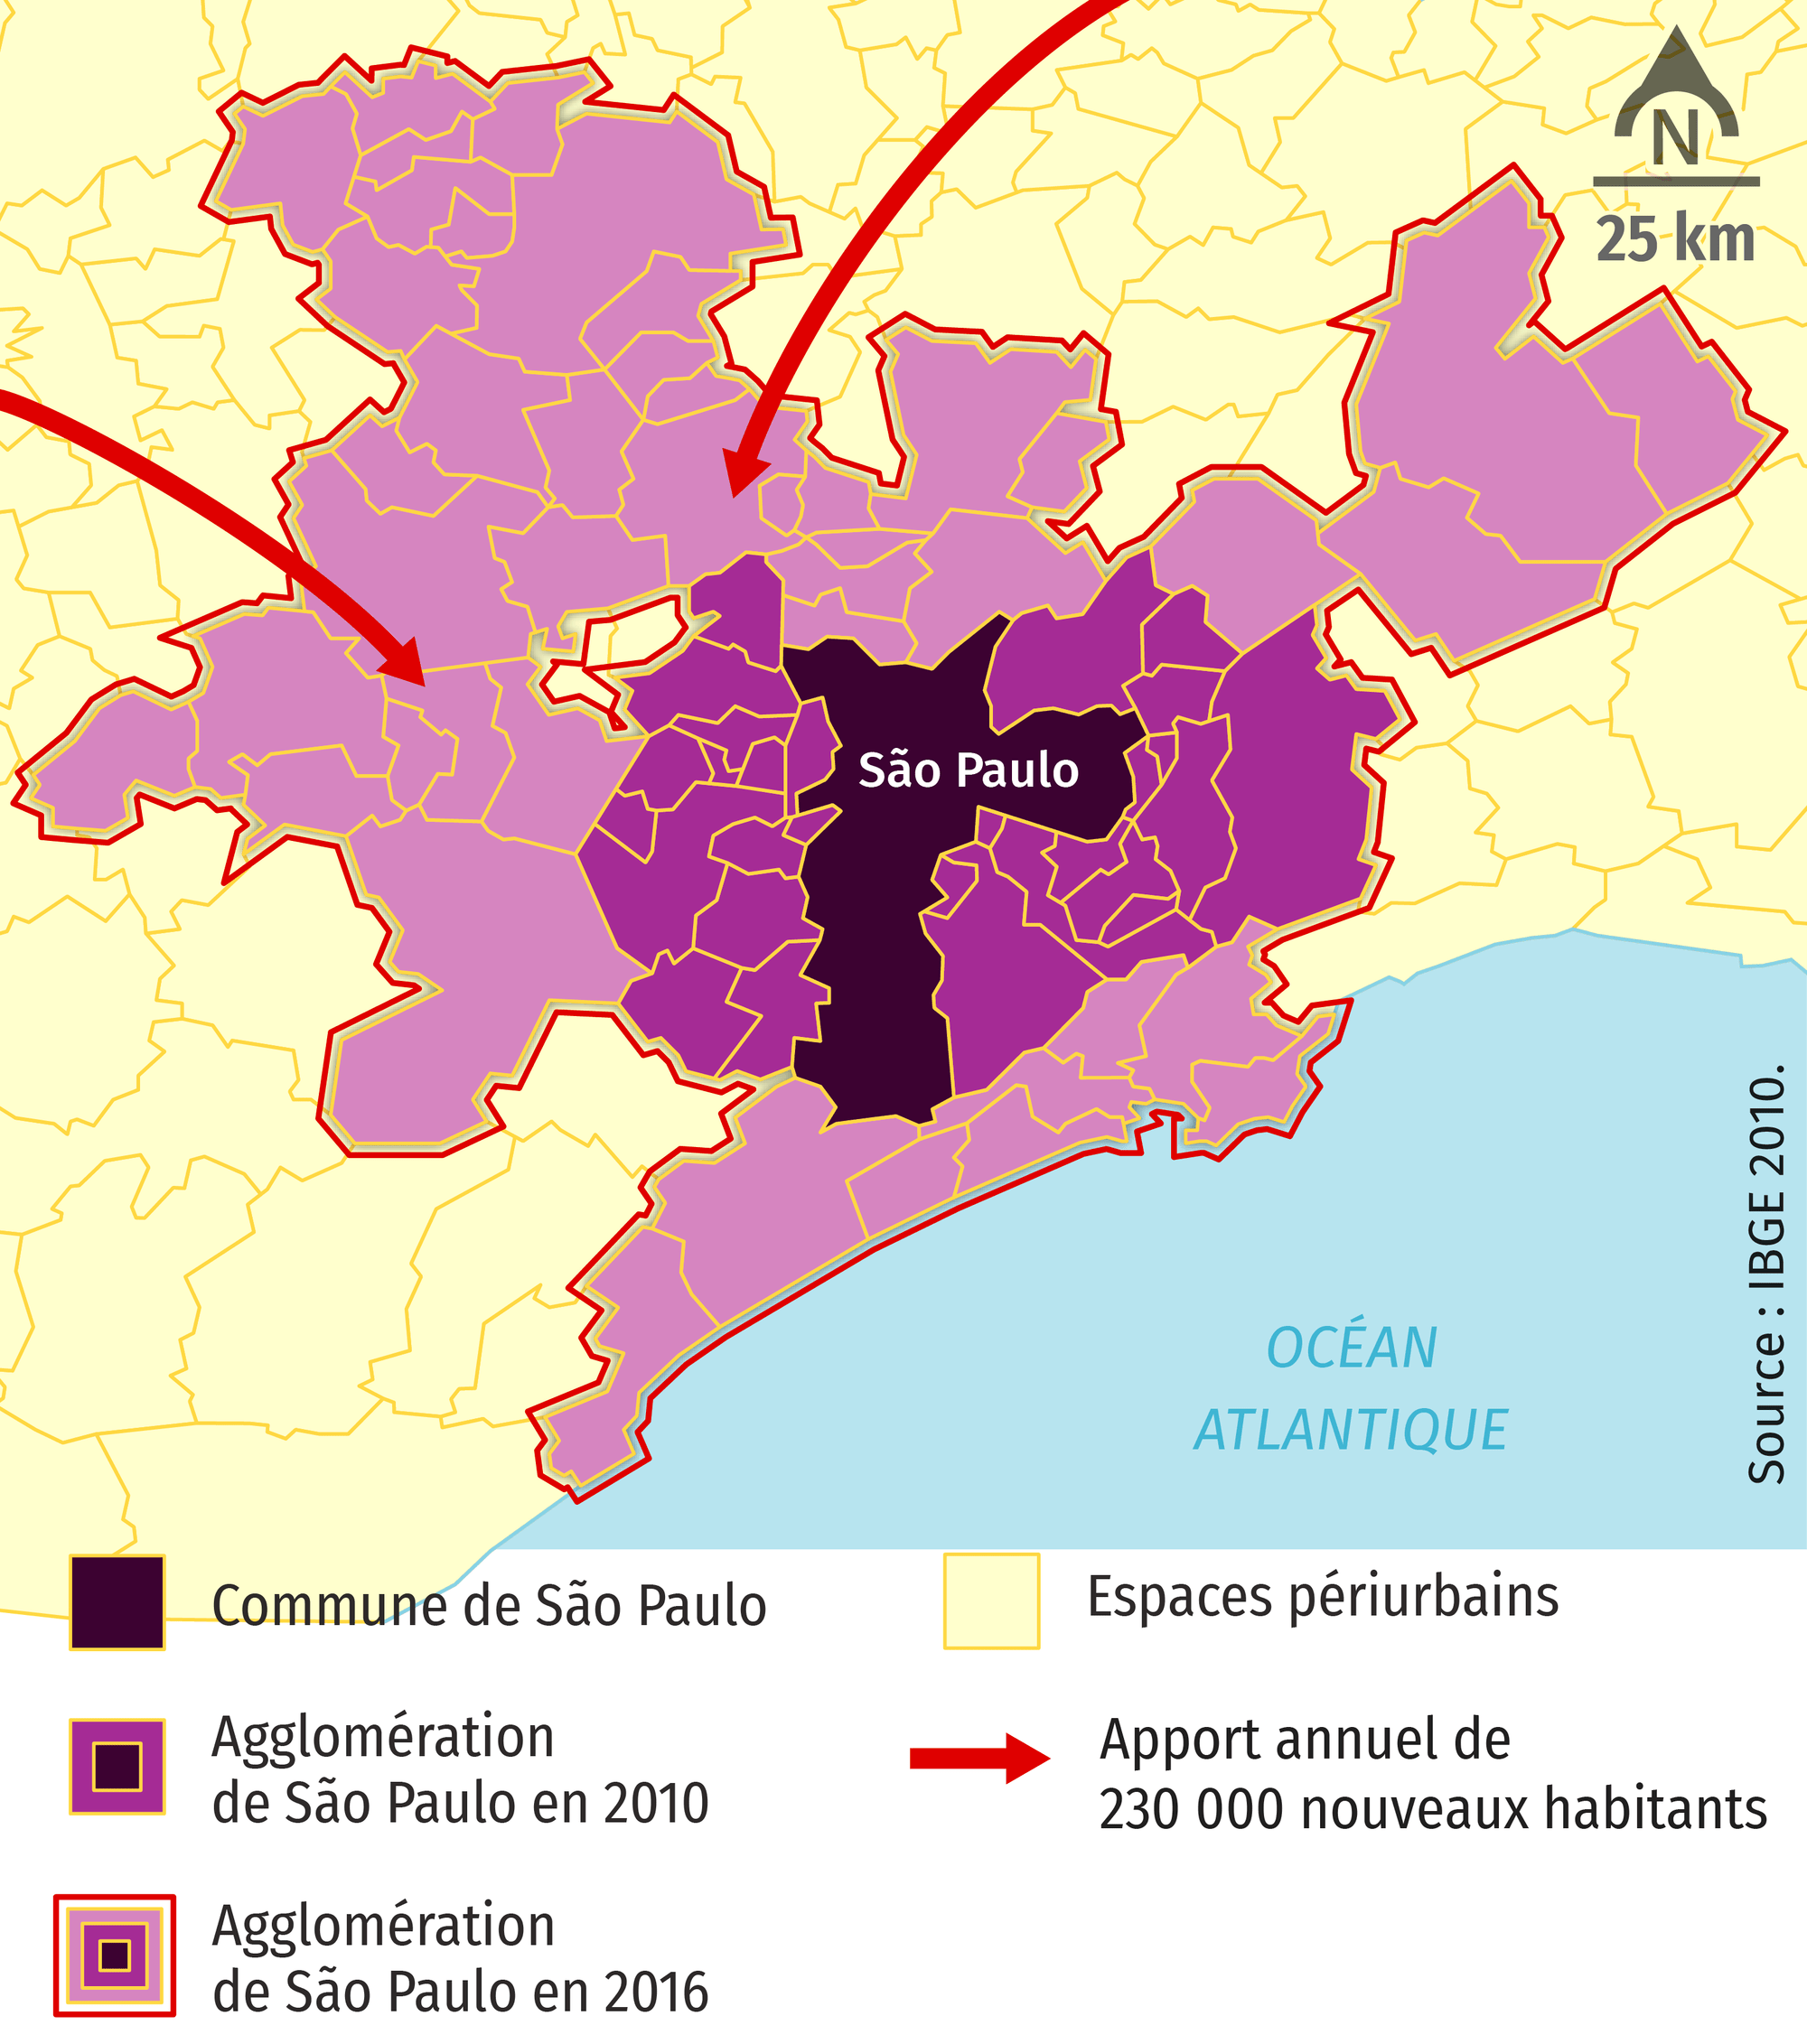 Évolution de la superficie de São Paulo depuis 2010